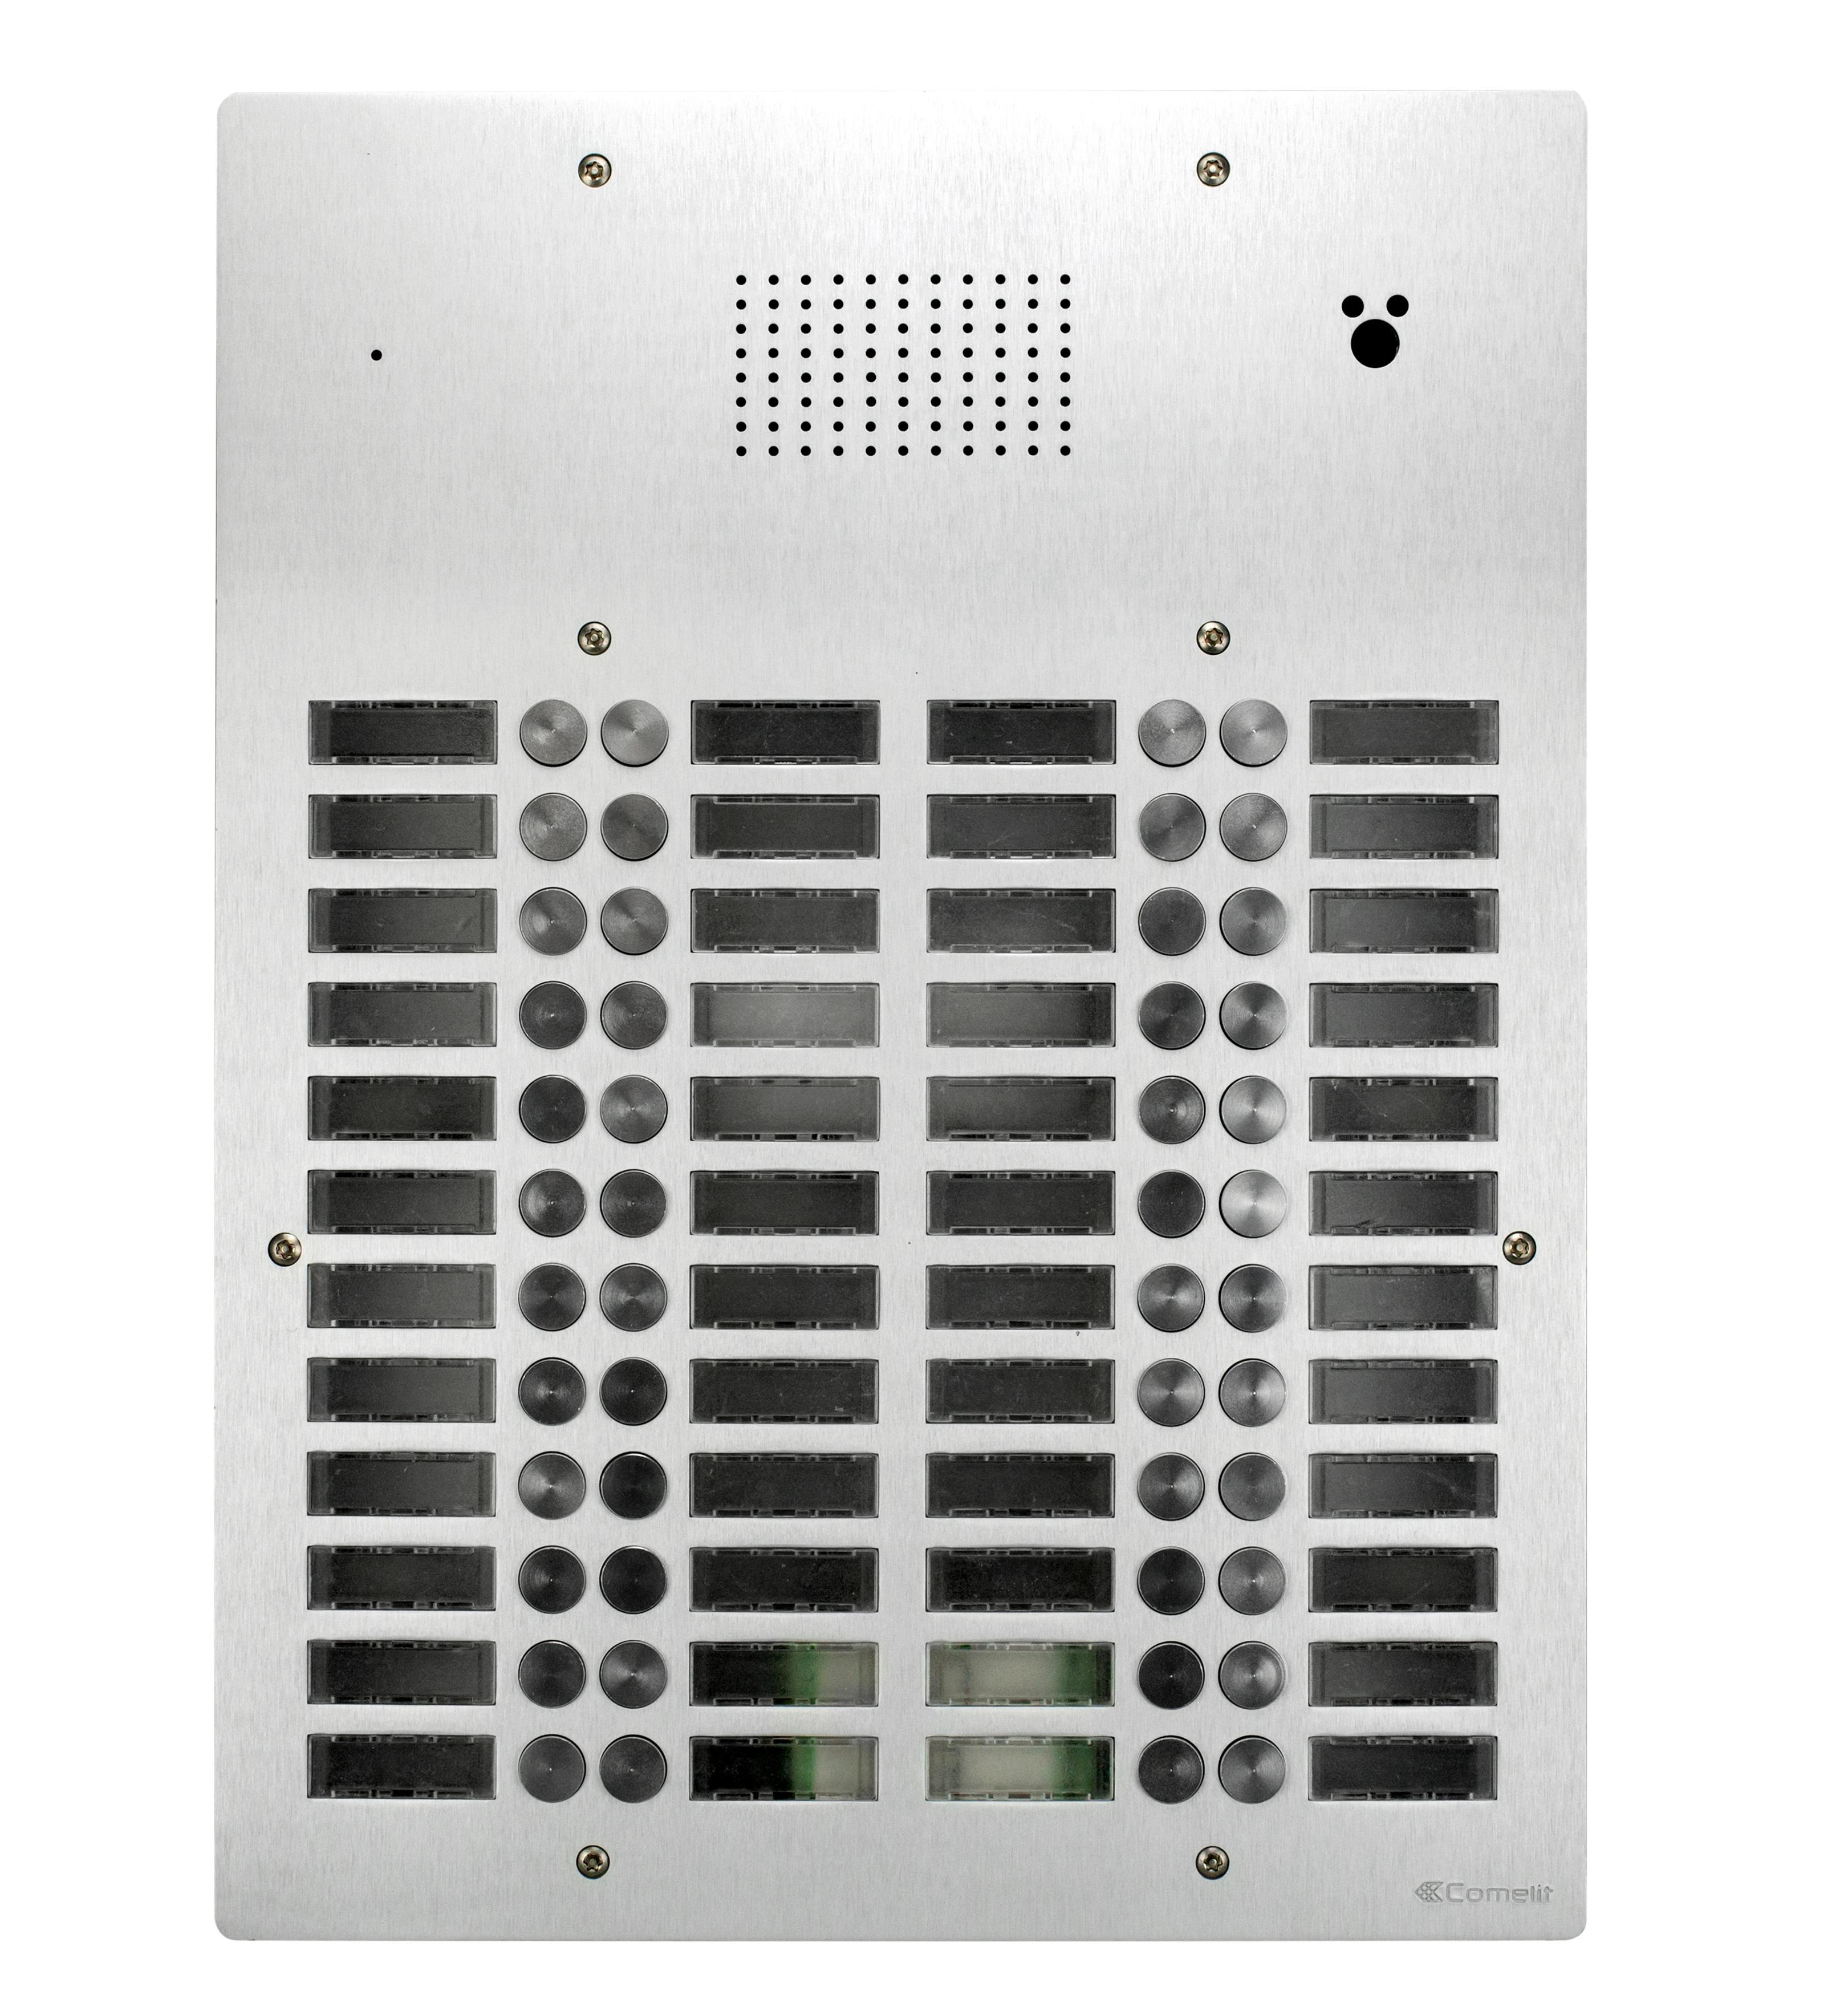 1 Stk AV-Panel Audio, 48 Tasten, mit Postschloss-Ausschnitt, Alu SP3048NAPT